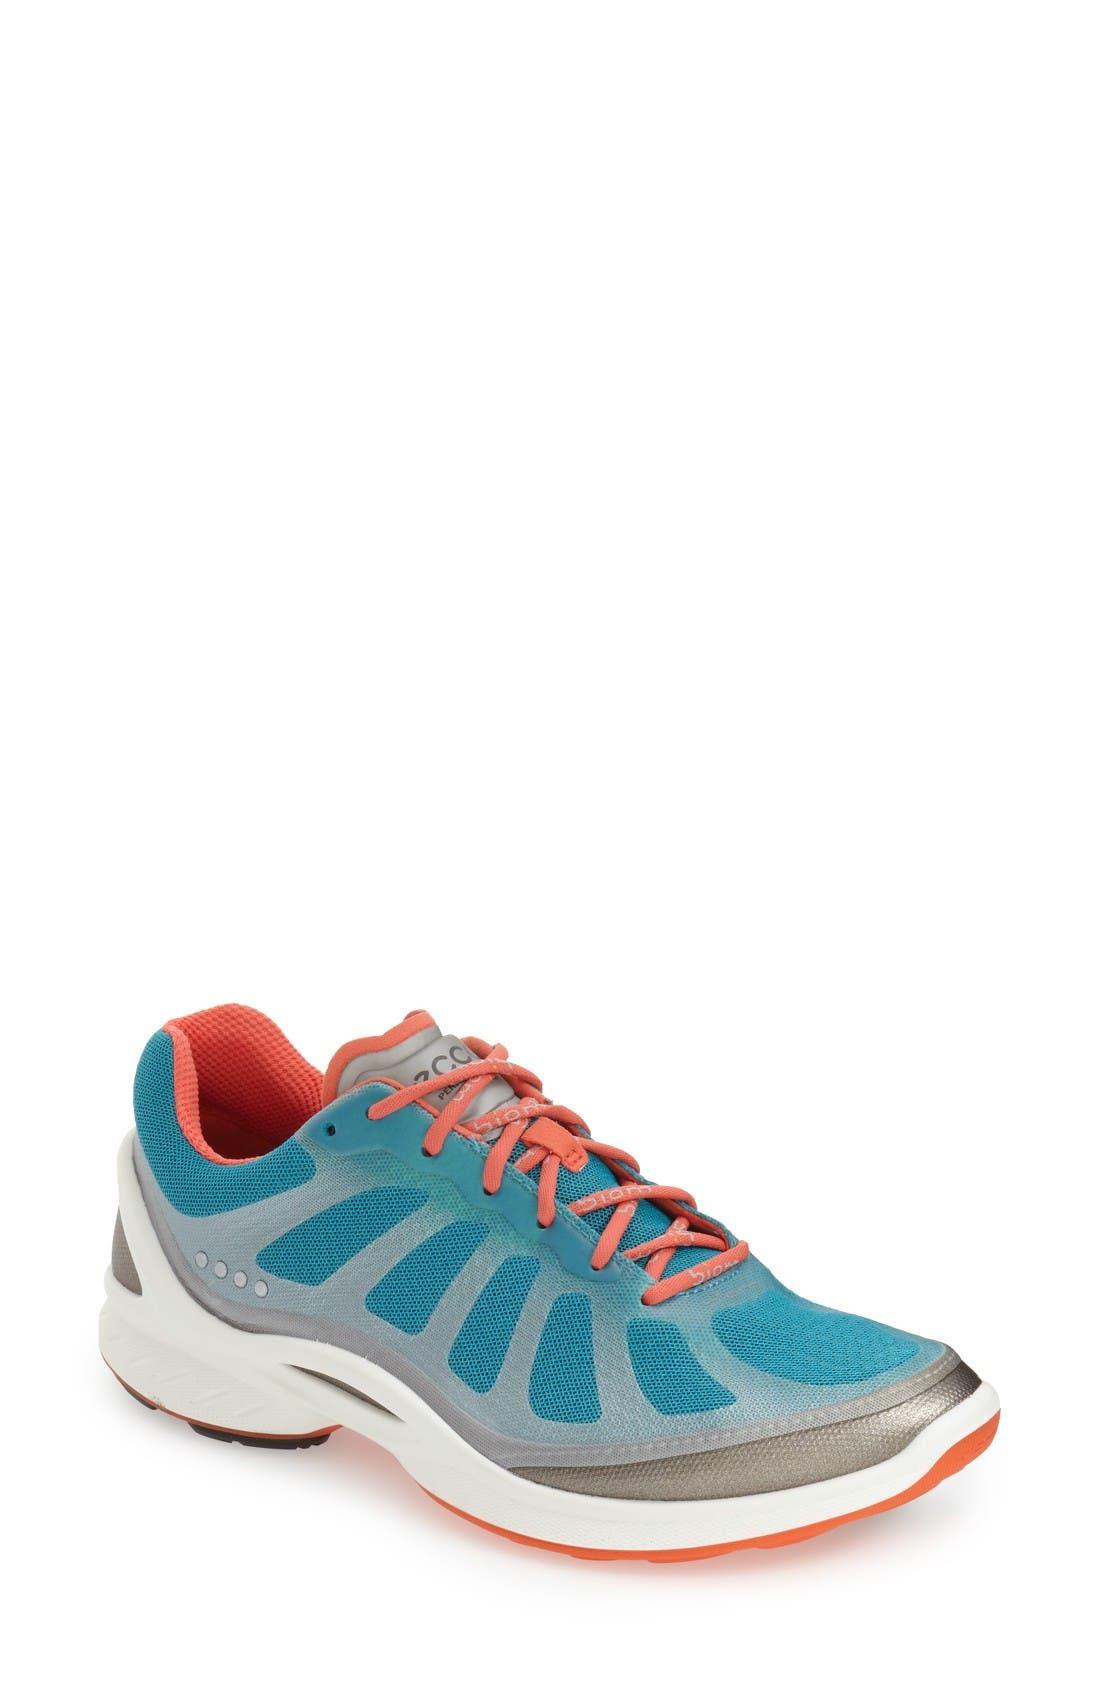 'BIOM Fjuel Racer' Sneaker,                             Main thumbnail 1, color,                             Capri Breeze / Coral